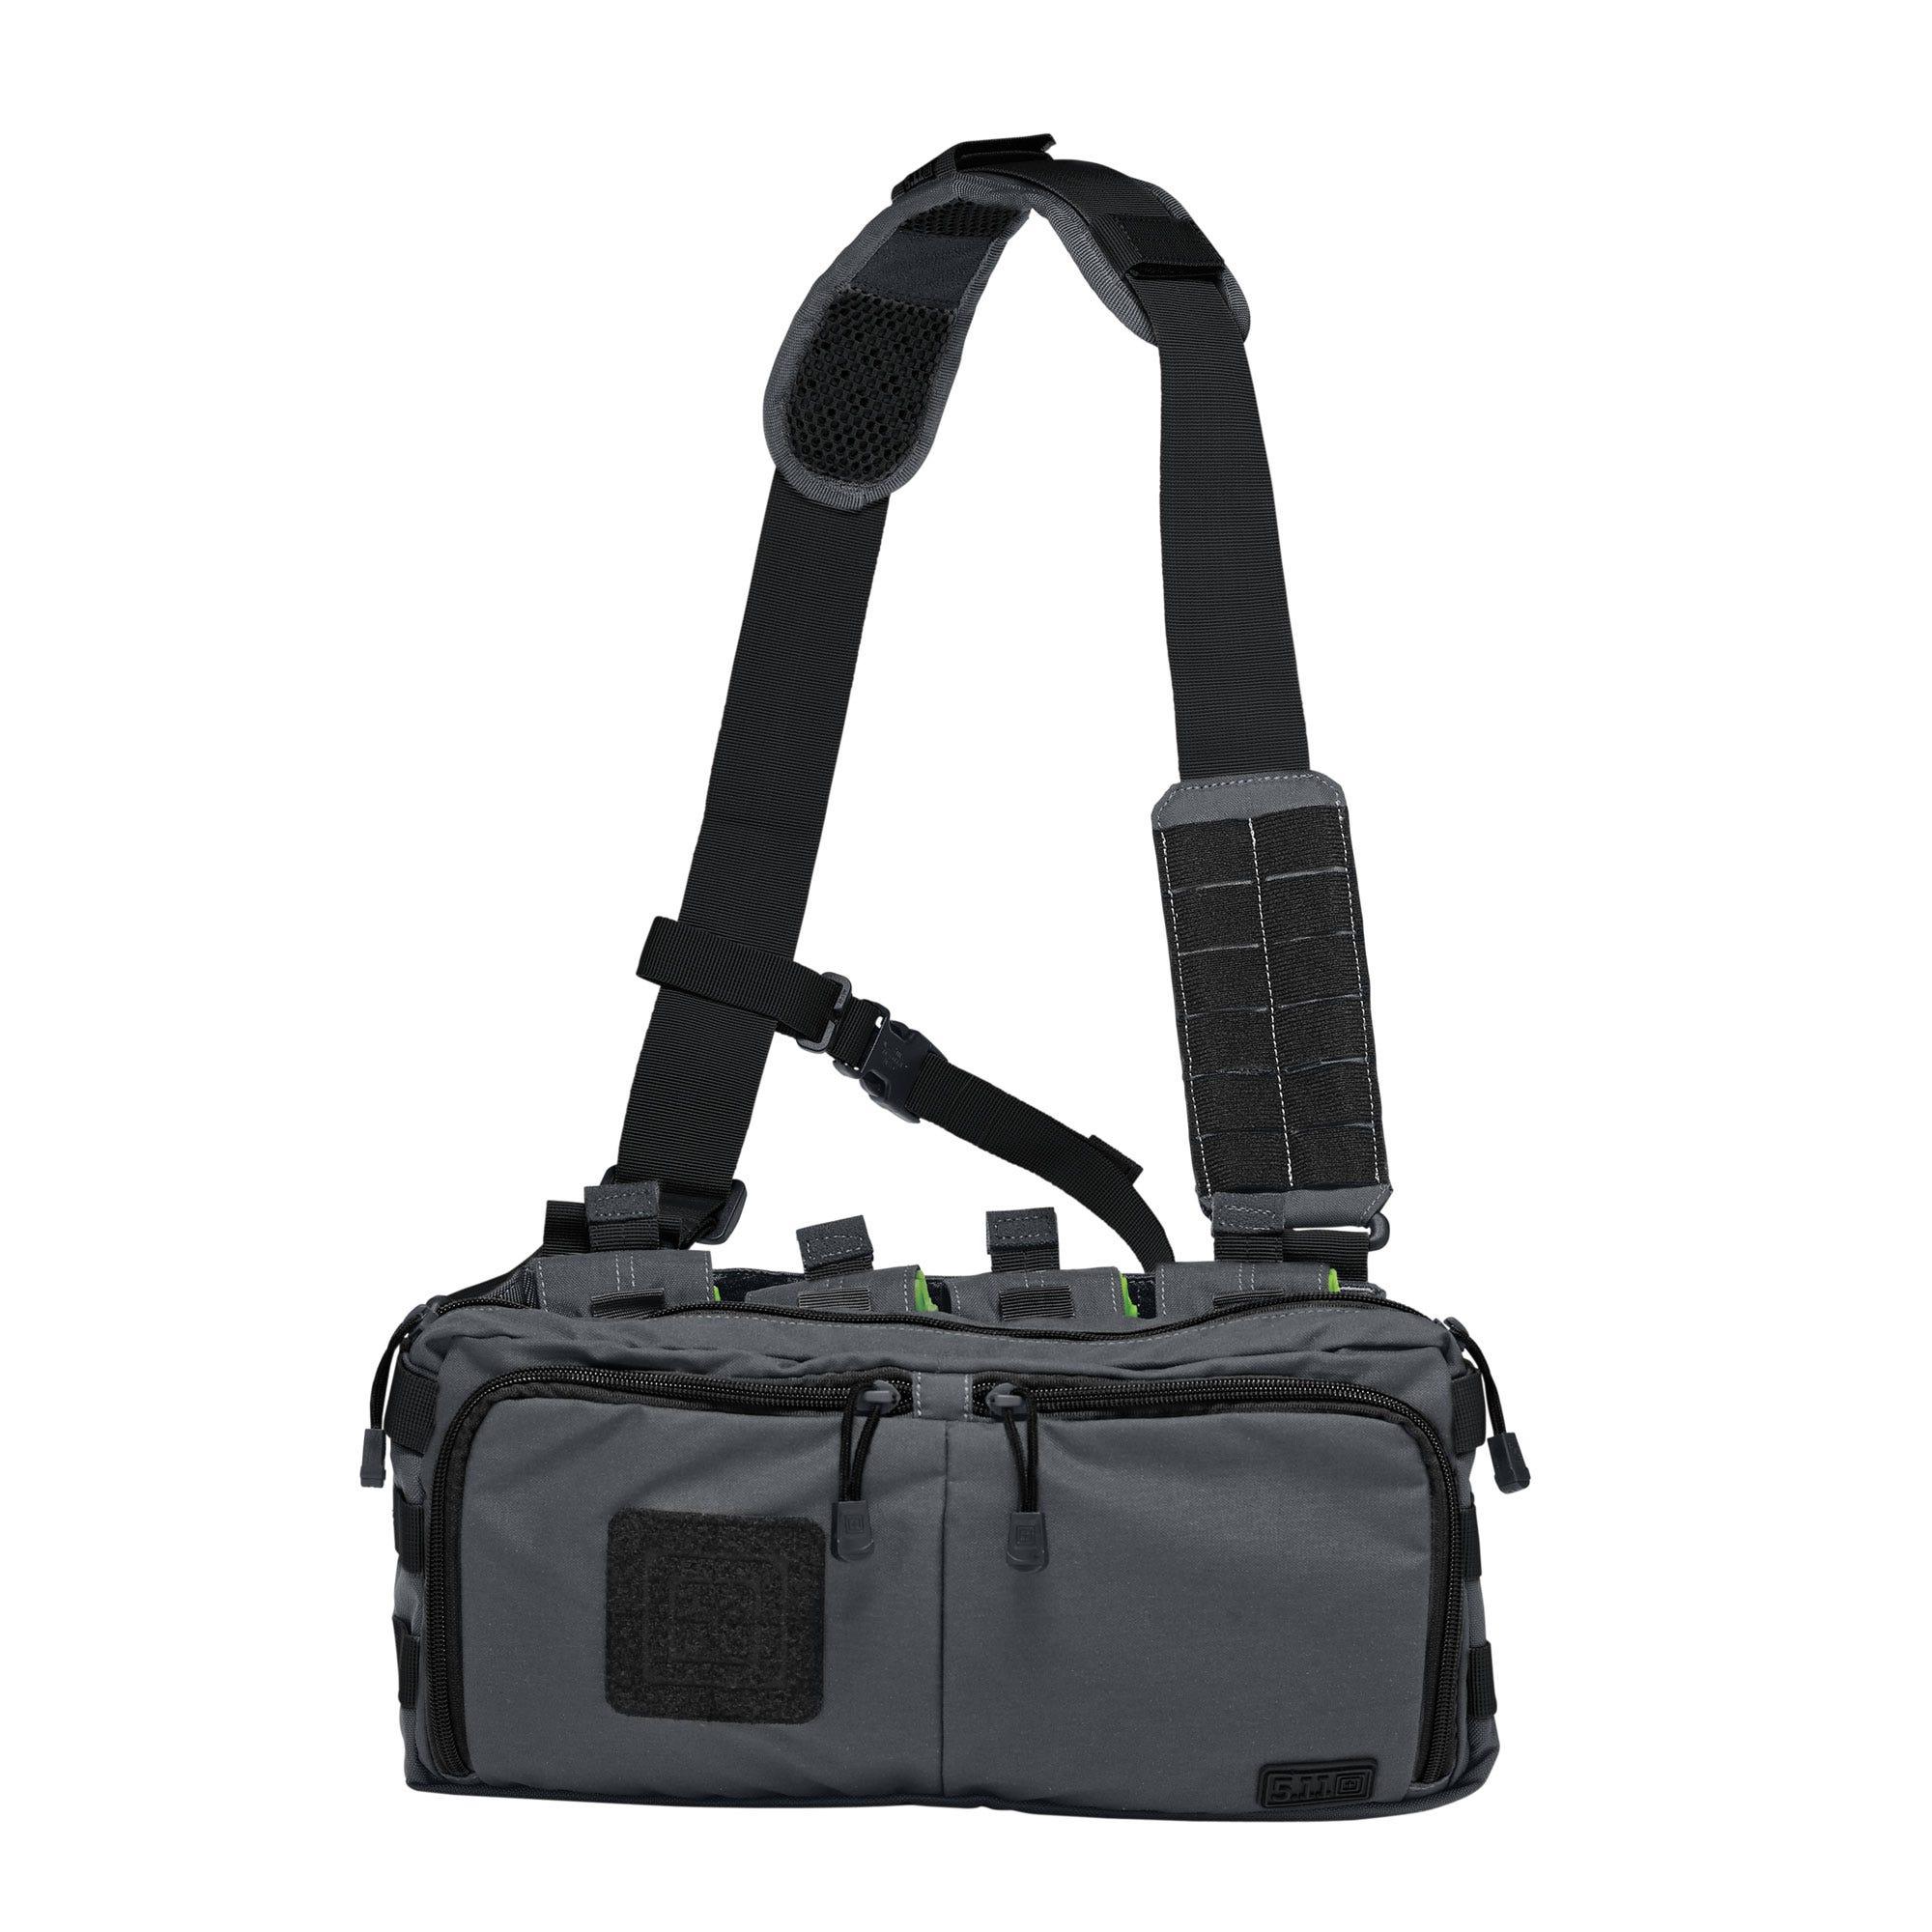 5.11 Tactical 4-Banger Bag (Black;Gray;Multi) thumbnail